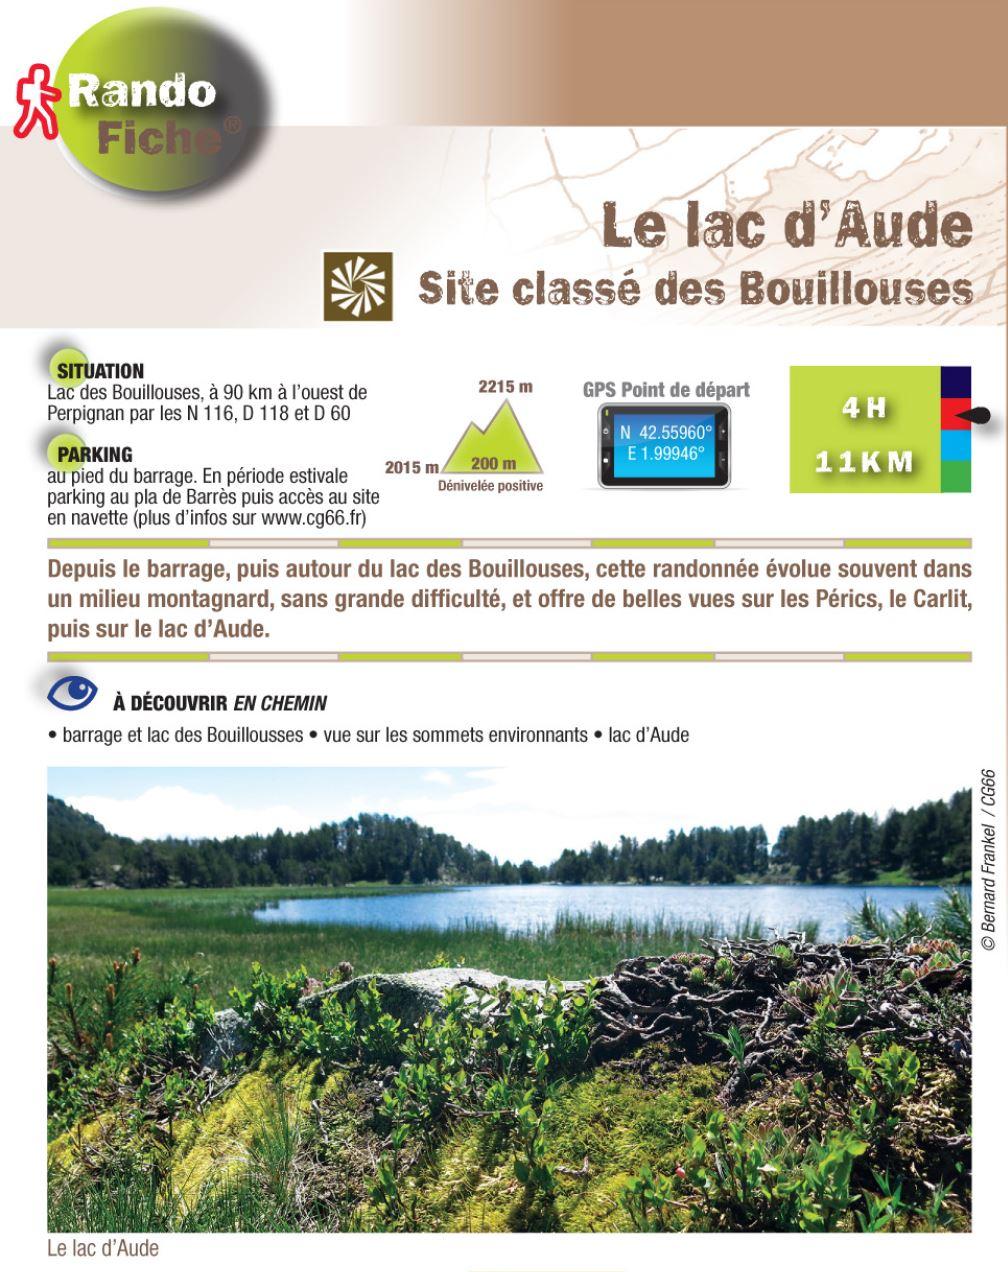 Rando Fiche Lac d'Aude - CG66